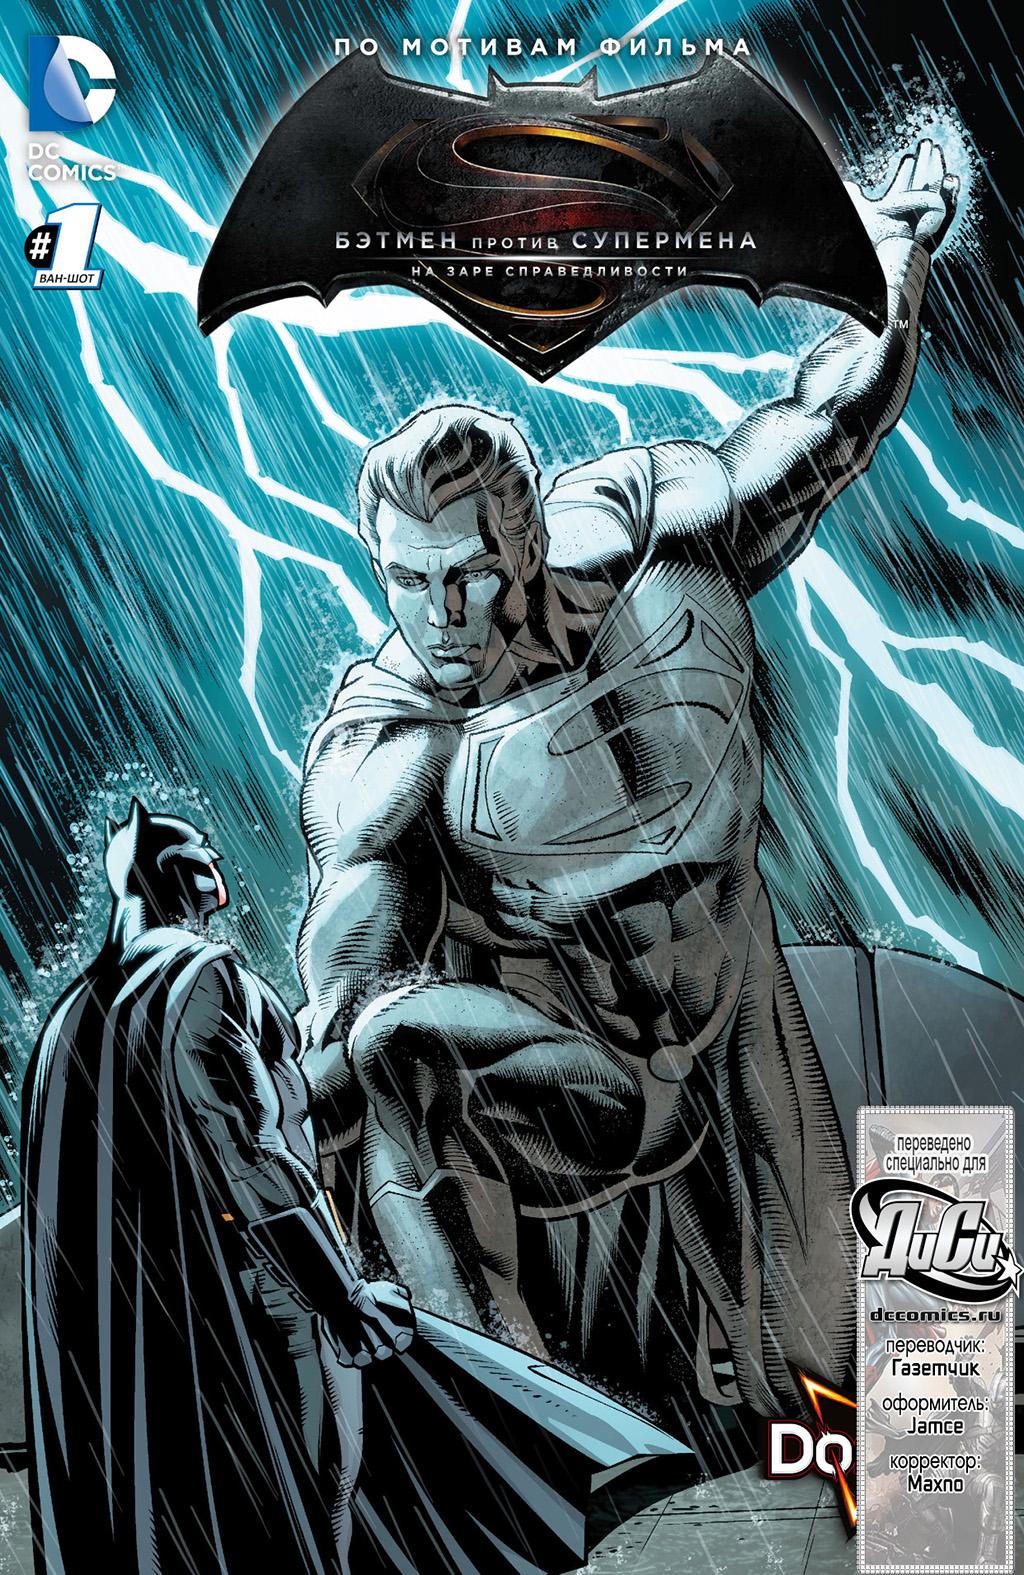 Комикс По мотивам фильма - Бэтмен против Супермена - На заре справедливости